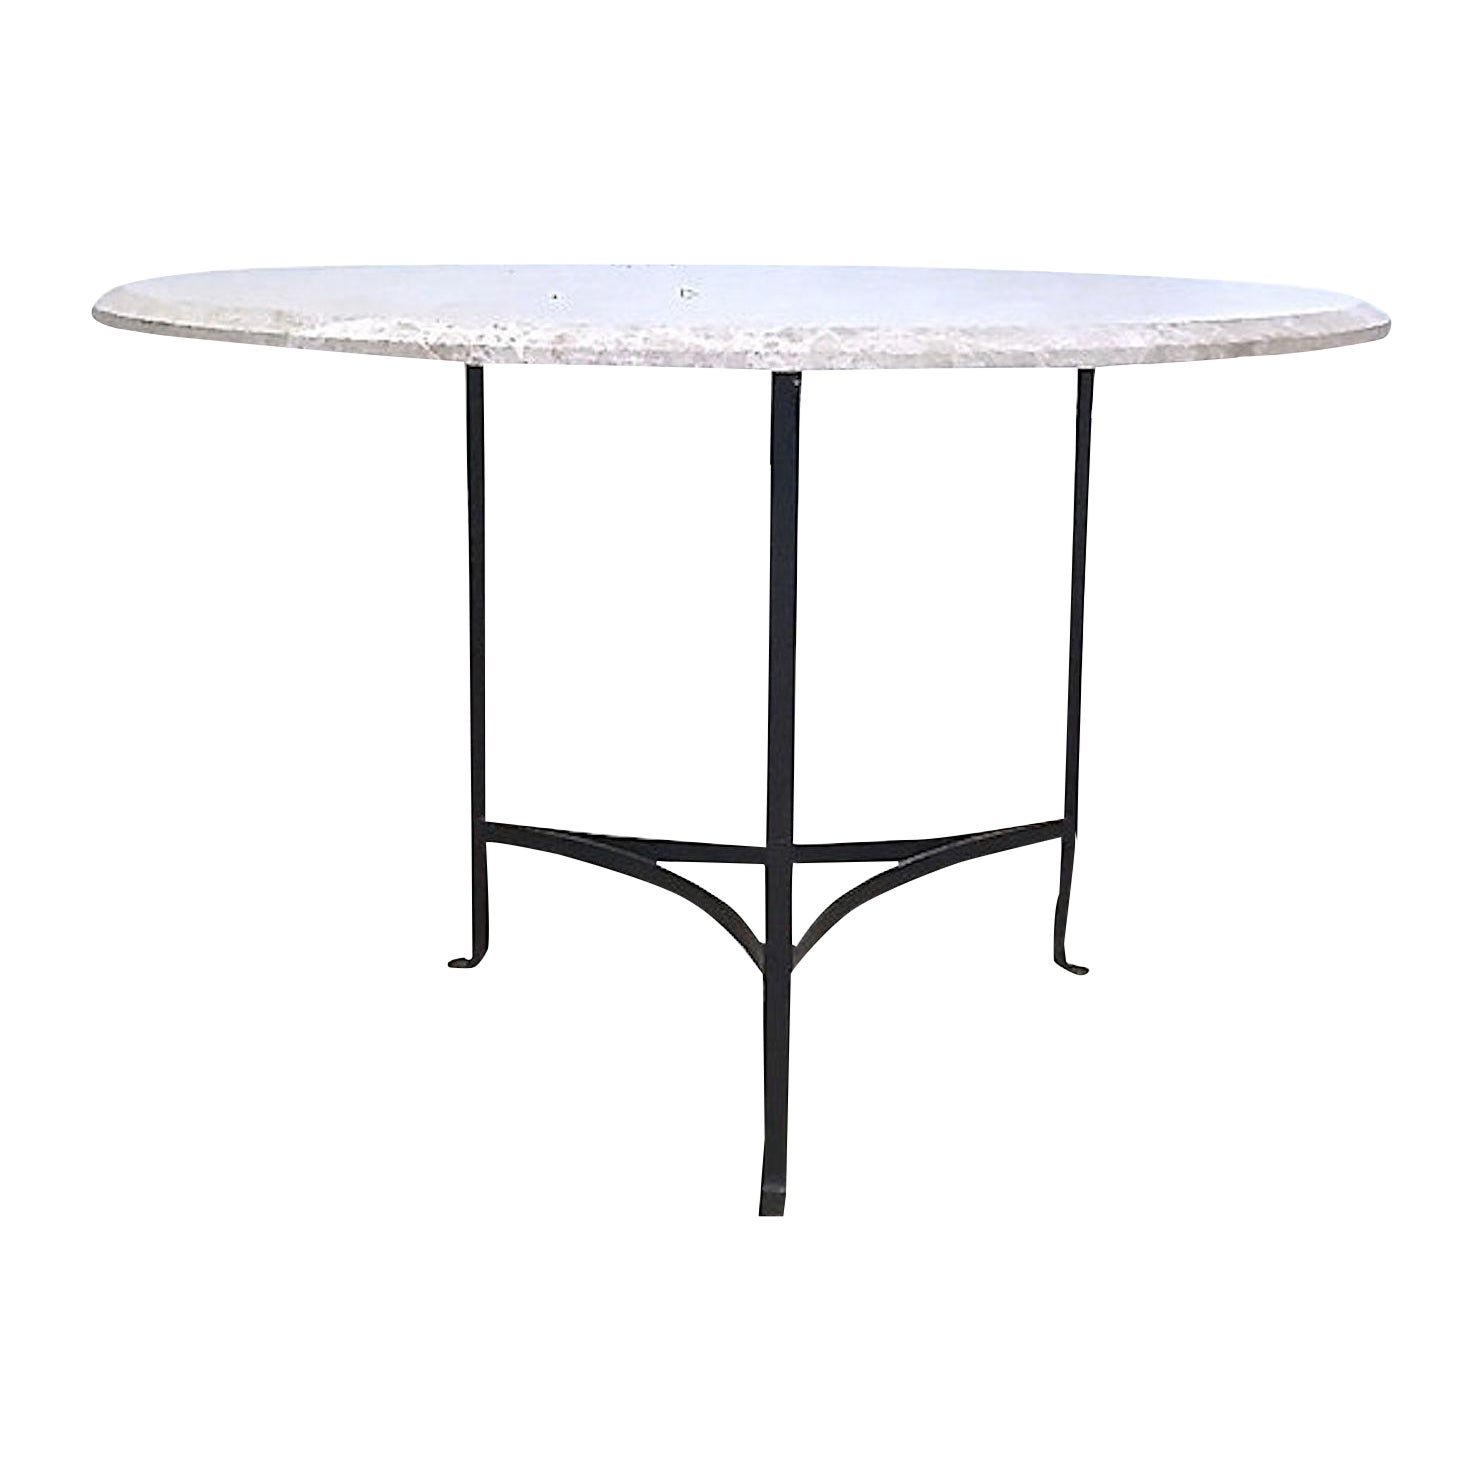 dining table_9_chairish.jpg